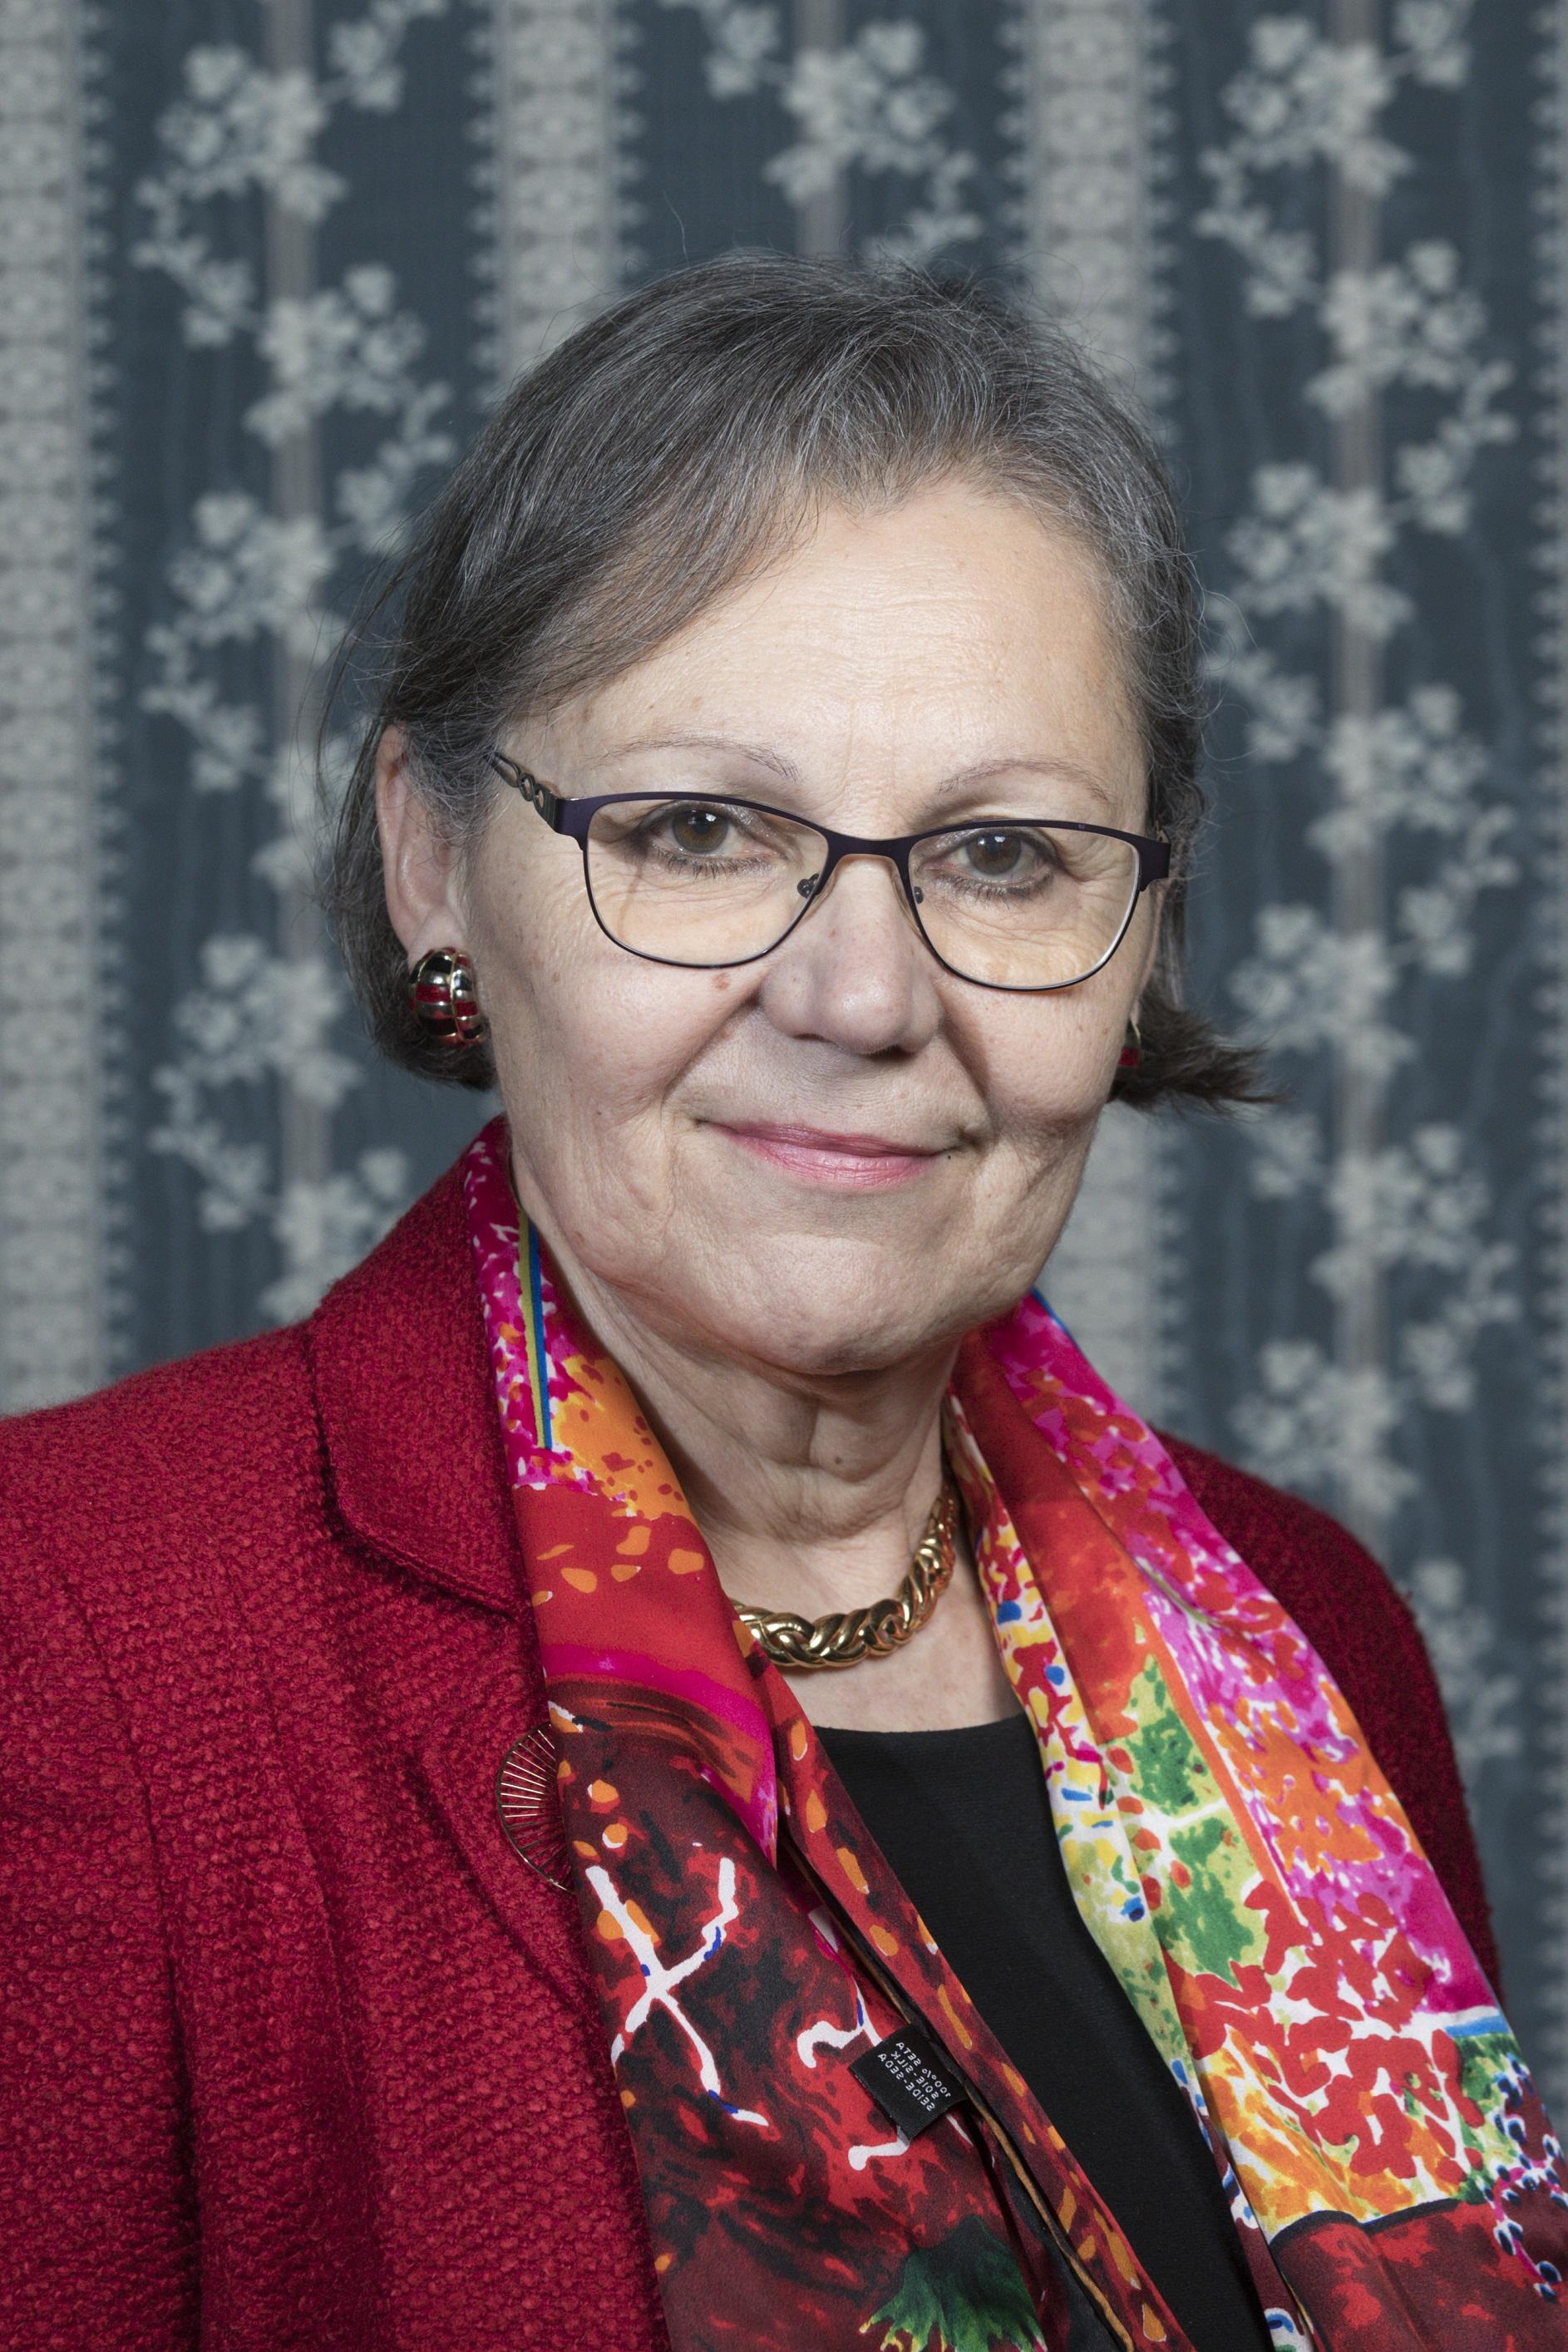 Jeanne-Marie Vermeulin